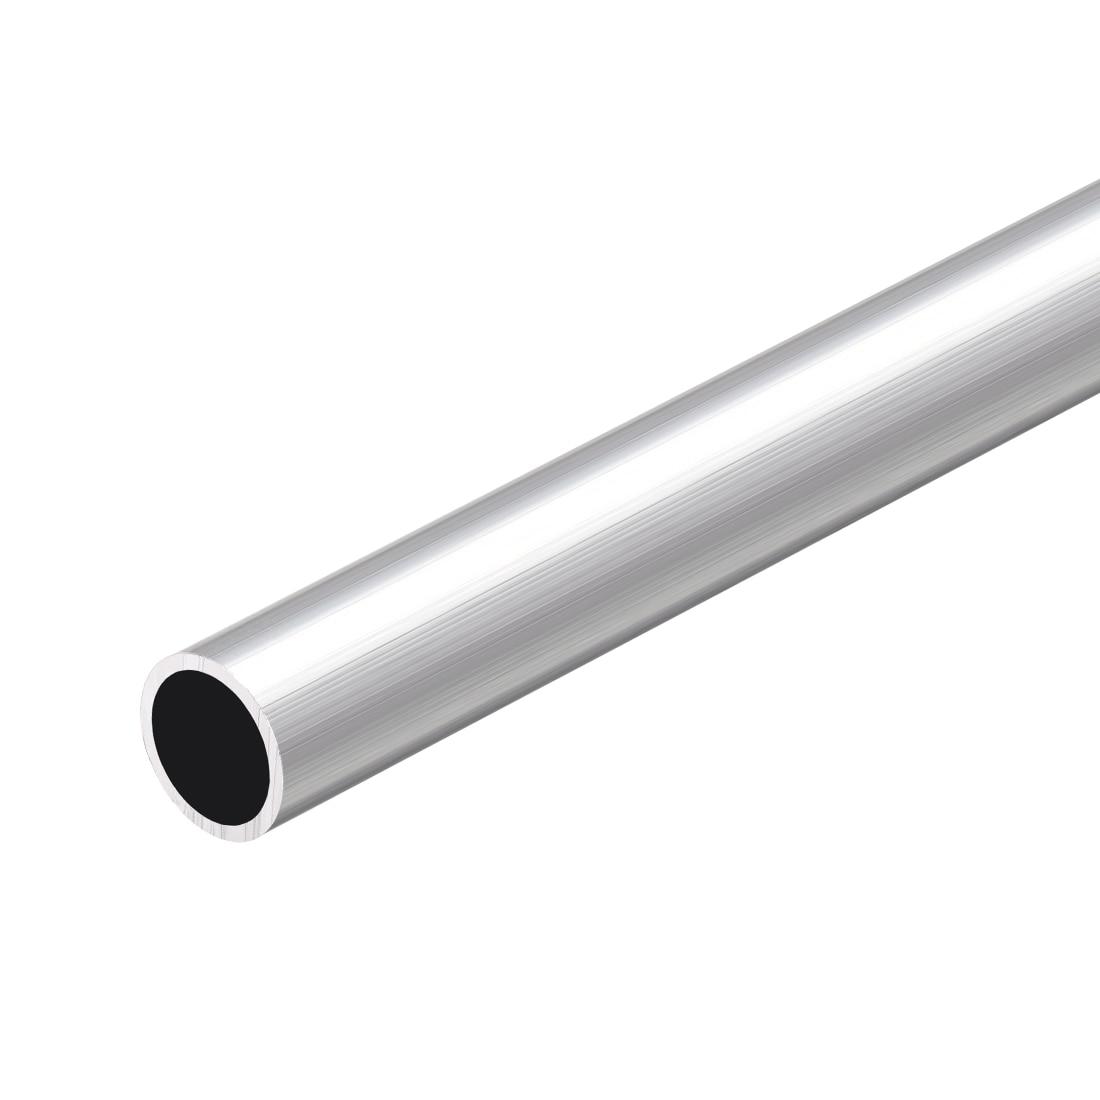 "ALUMINIUM ROUND STRAIGHT TUBE PIPE 1.5/"" 38mm OD x 300mm 1 FEET 2mm WALL THICK"